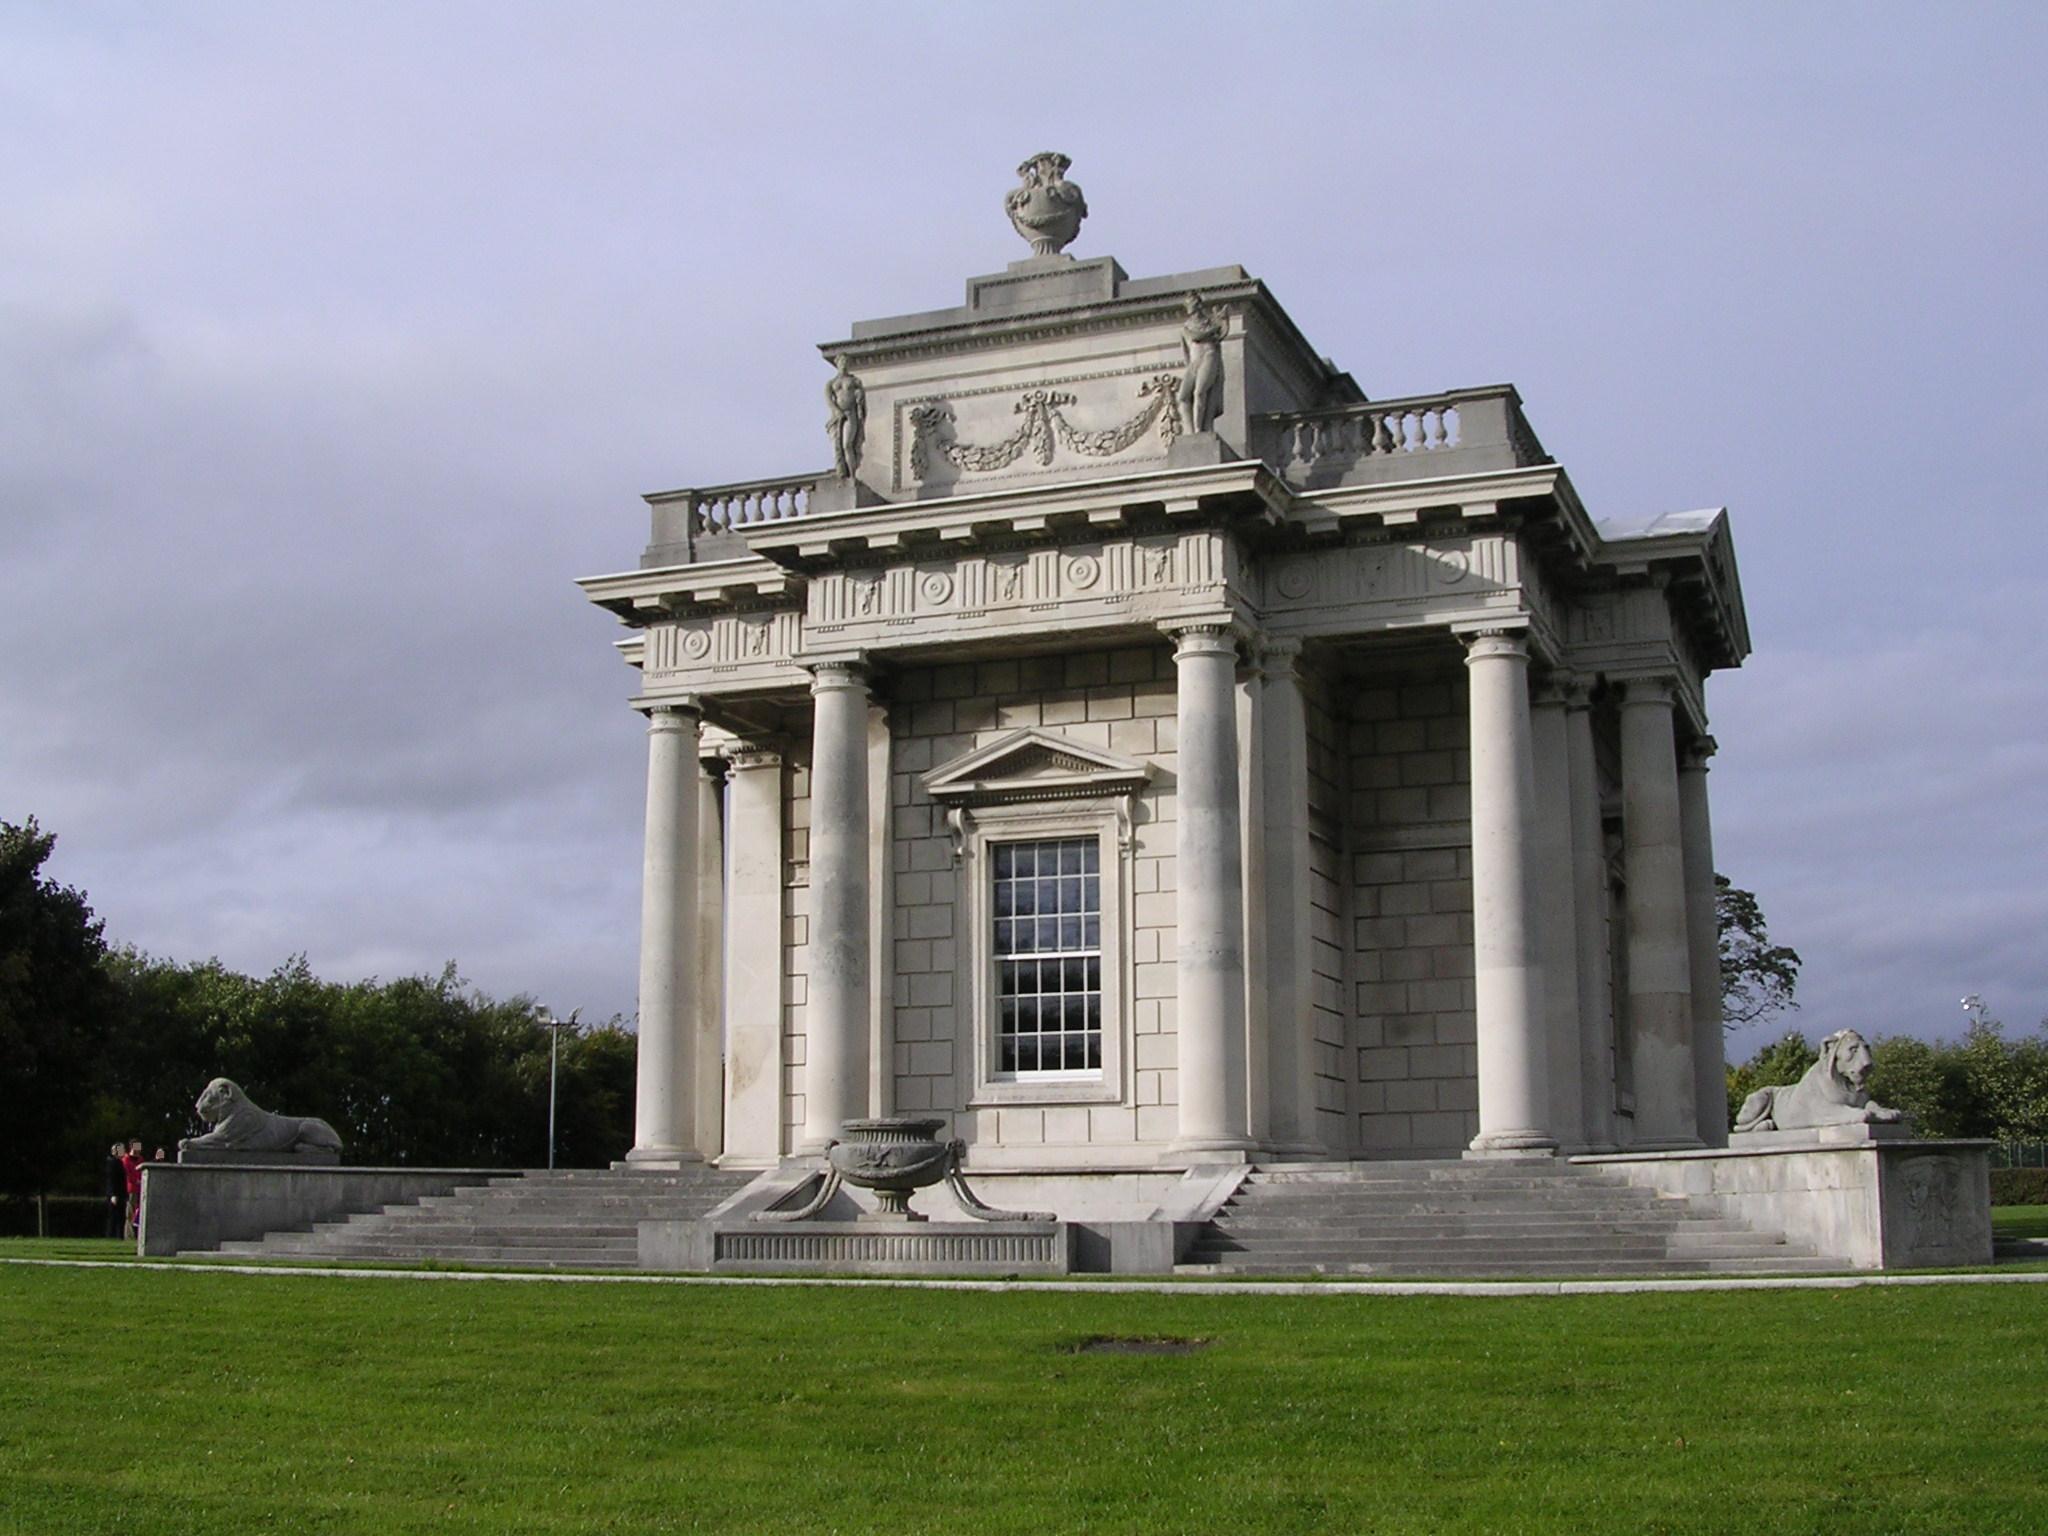 Explore Irish Palladianism This September